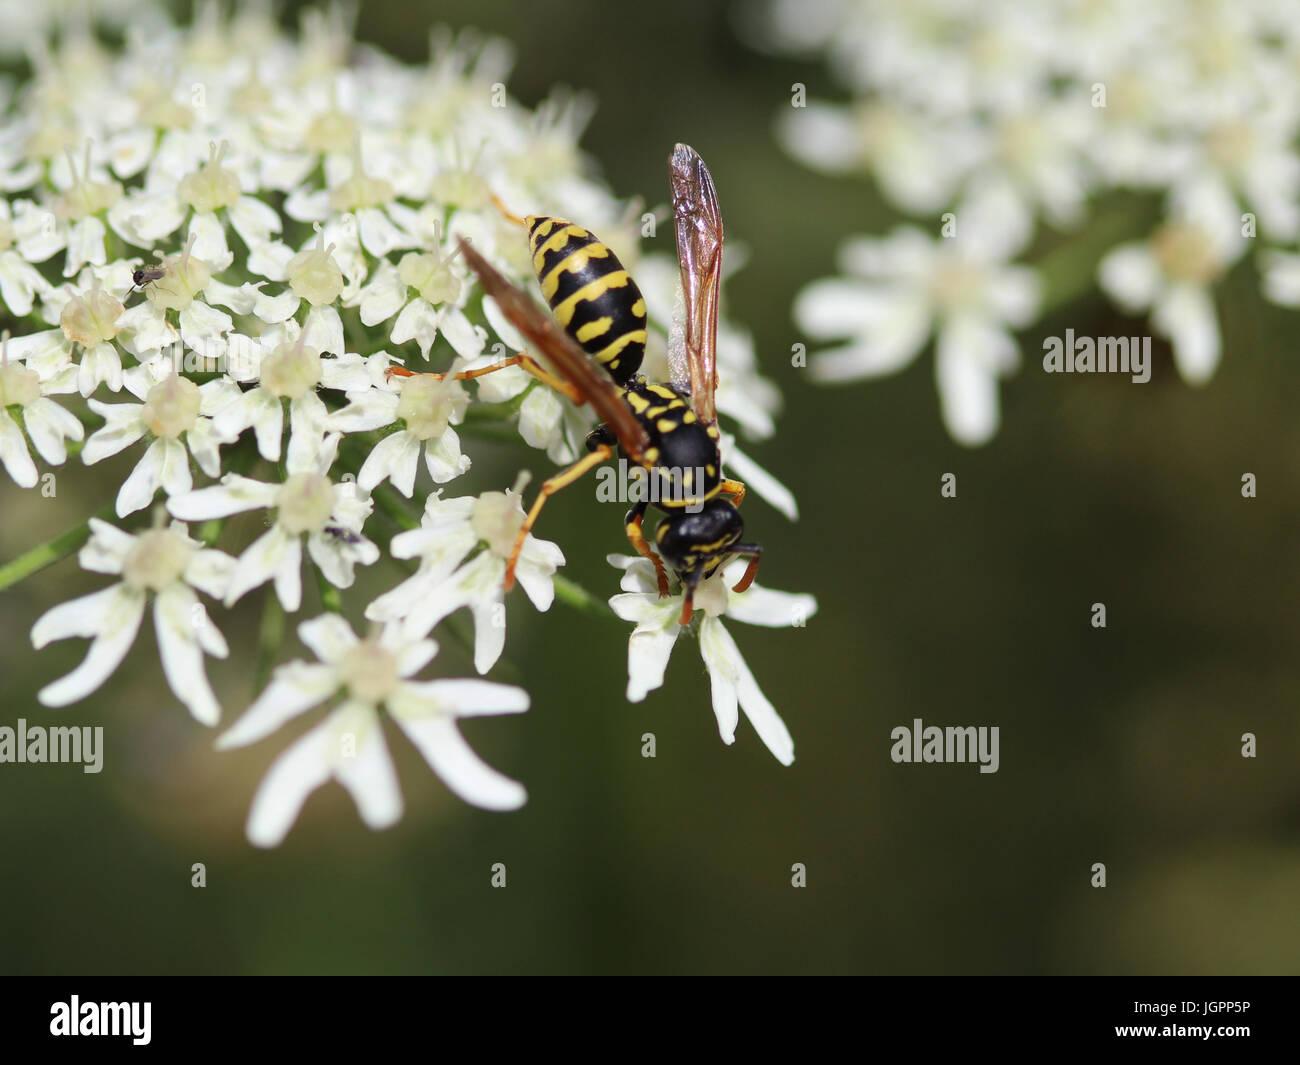 Common wasp (Vespula vulgaris) - Stock Image